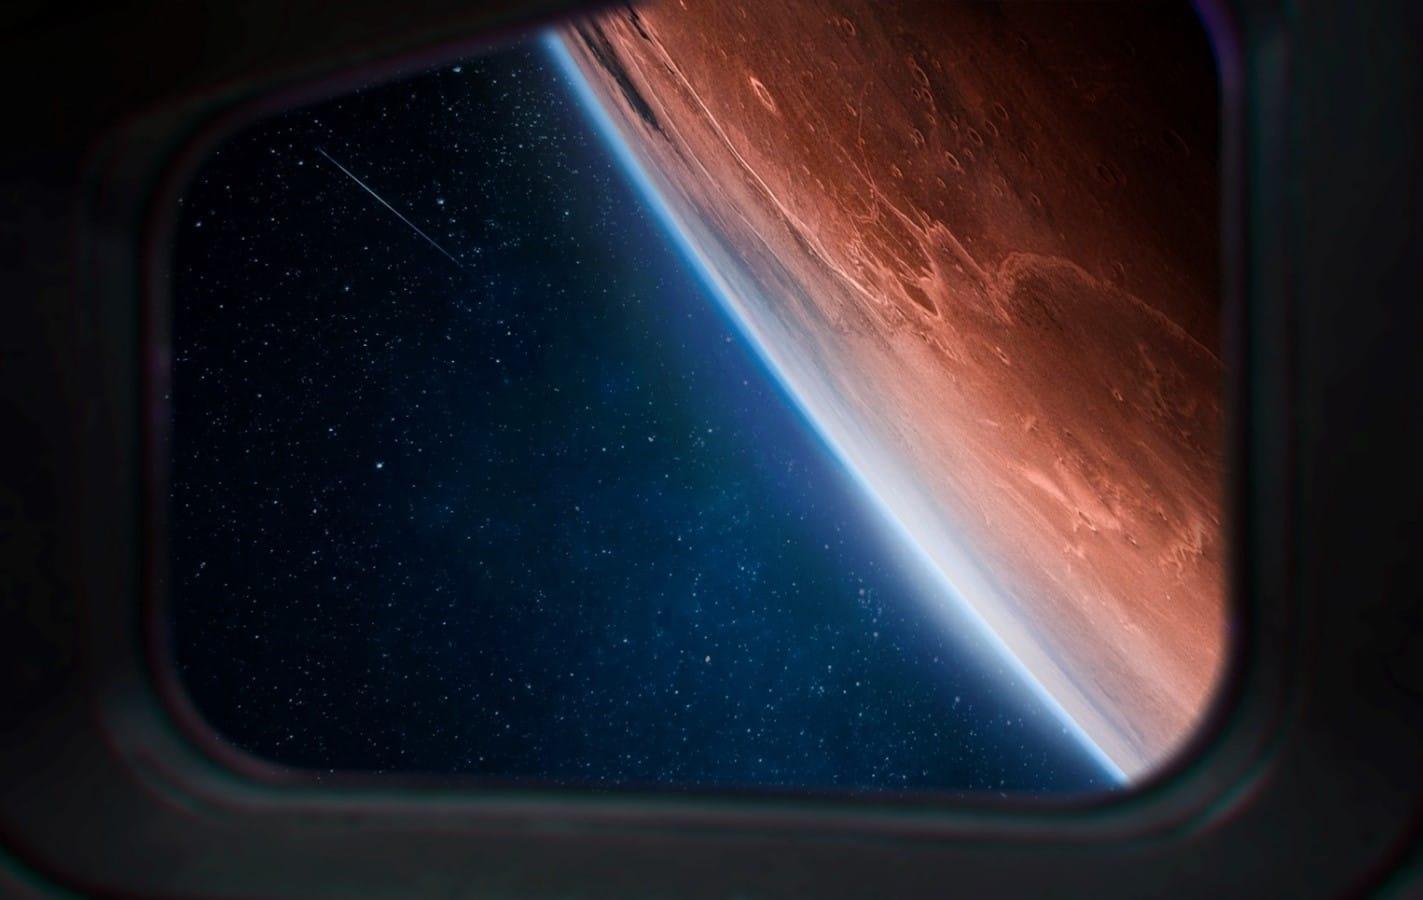 Mars through spaceship window